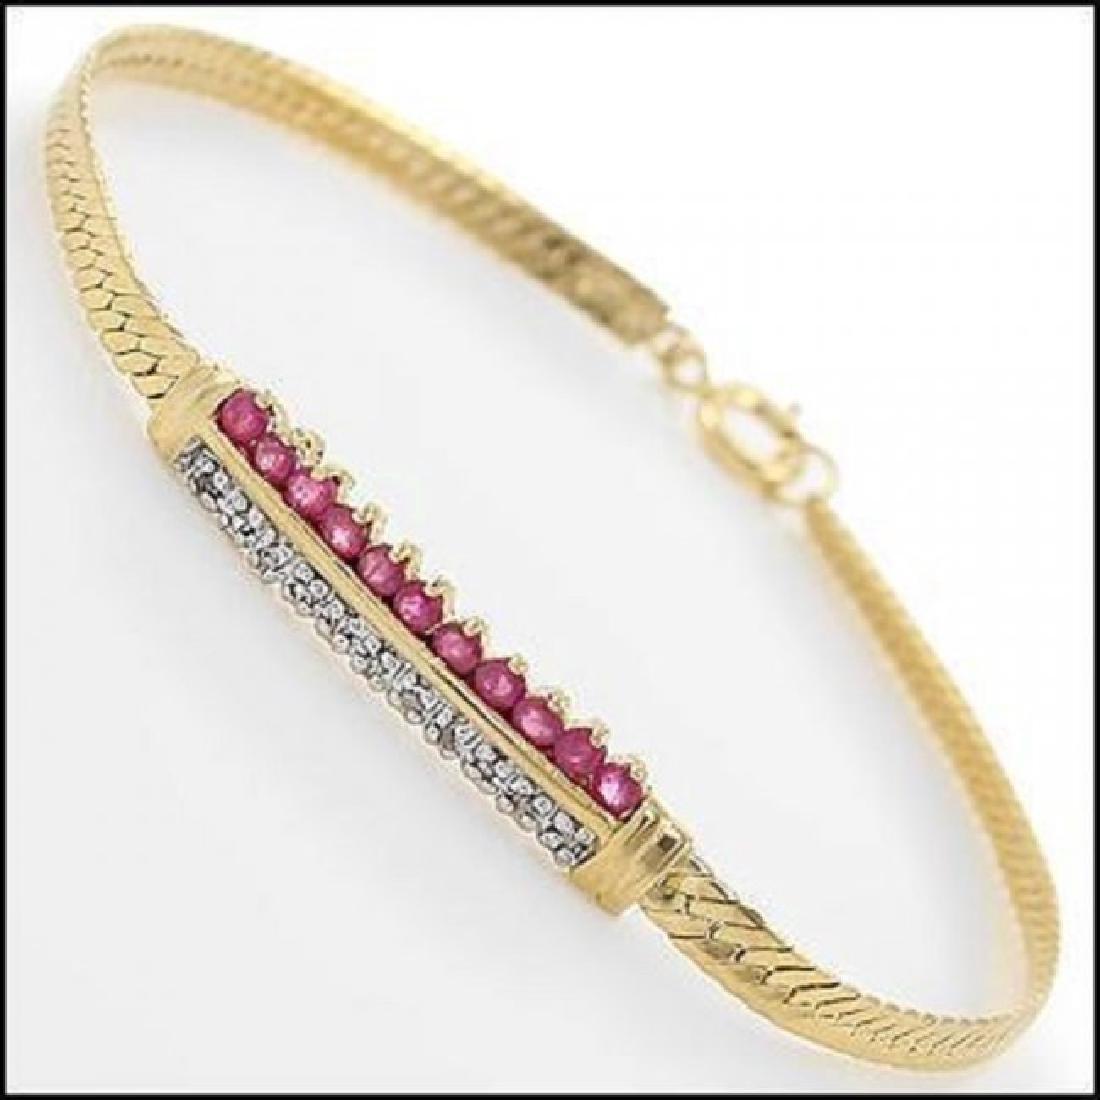 3.39 CT Ruby & Diamond Designer Bracelet $960